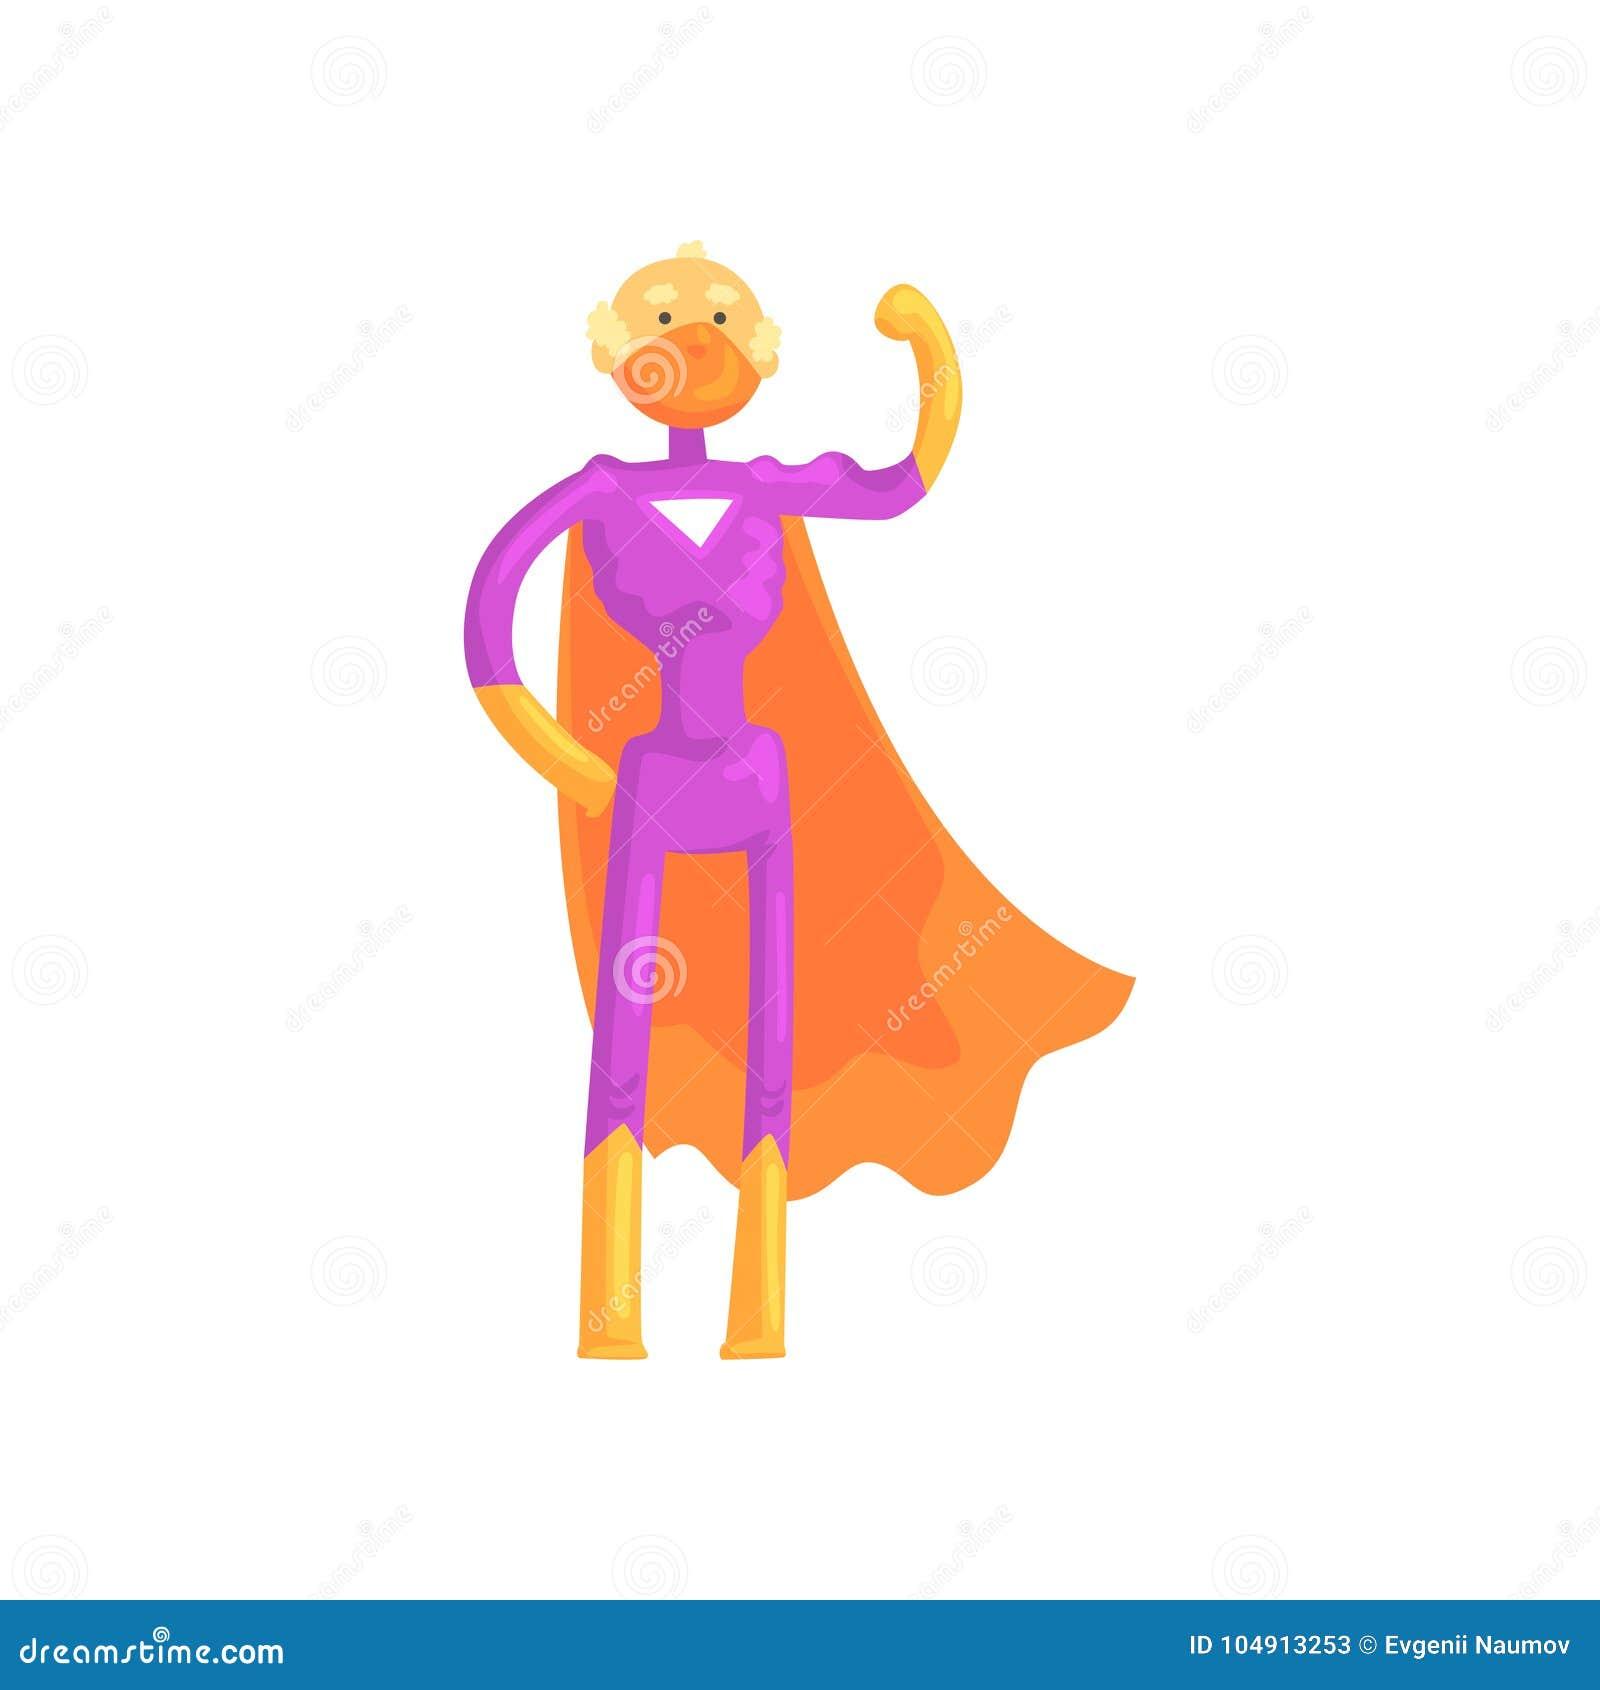 cartoon character of elderly superhero in classic comics costume